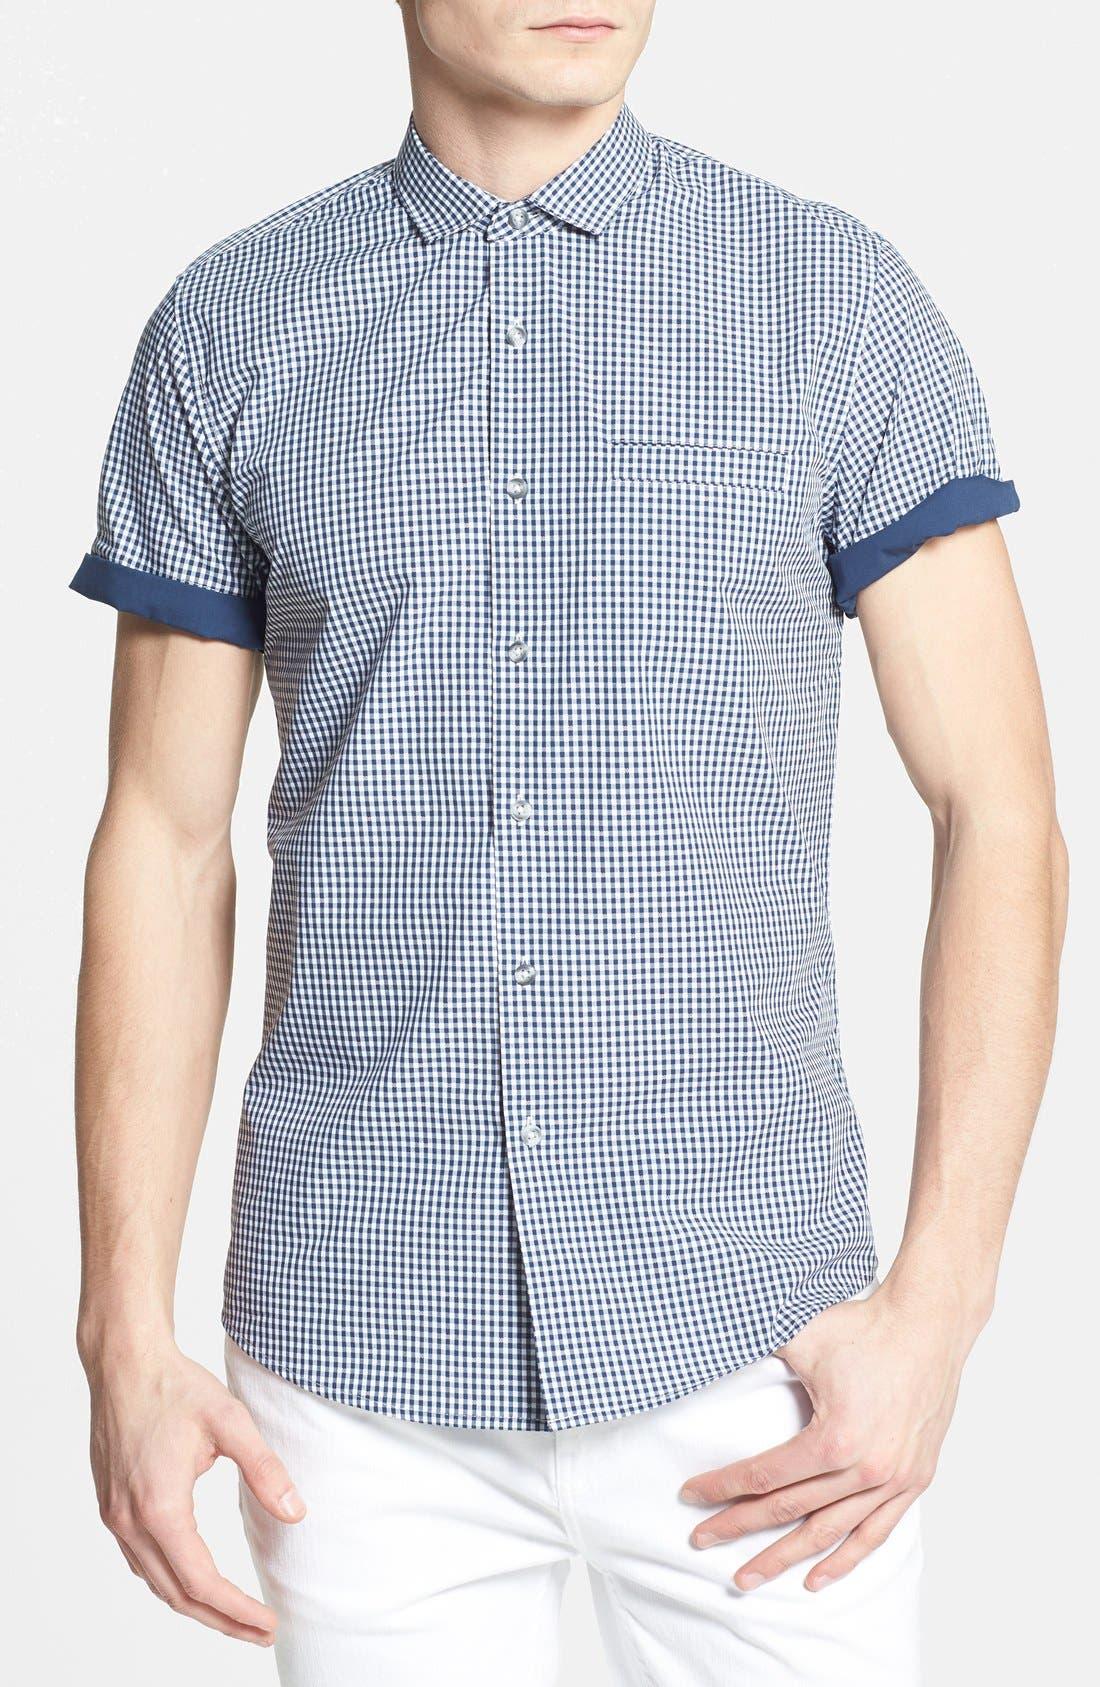 Alternate Image 1 Selected - Topman Slim Fit Short Sleeve Gingham Shirt